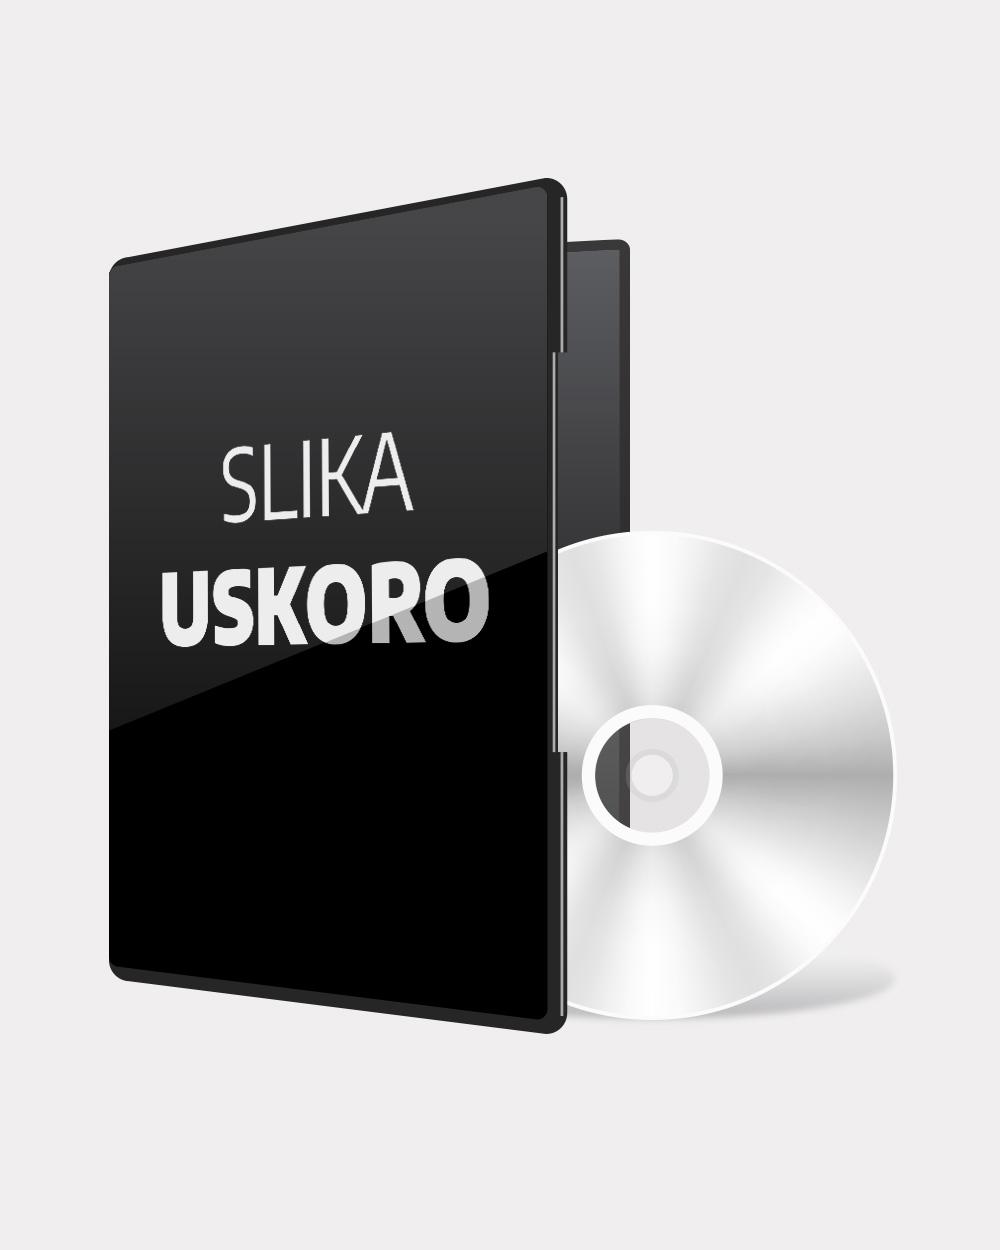 XBOX ONE Wolfenstein 2 - The New Colossus